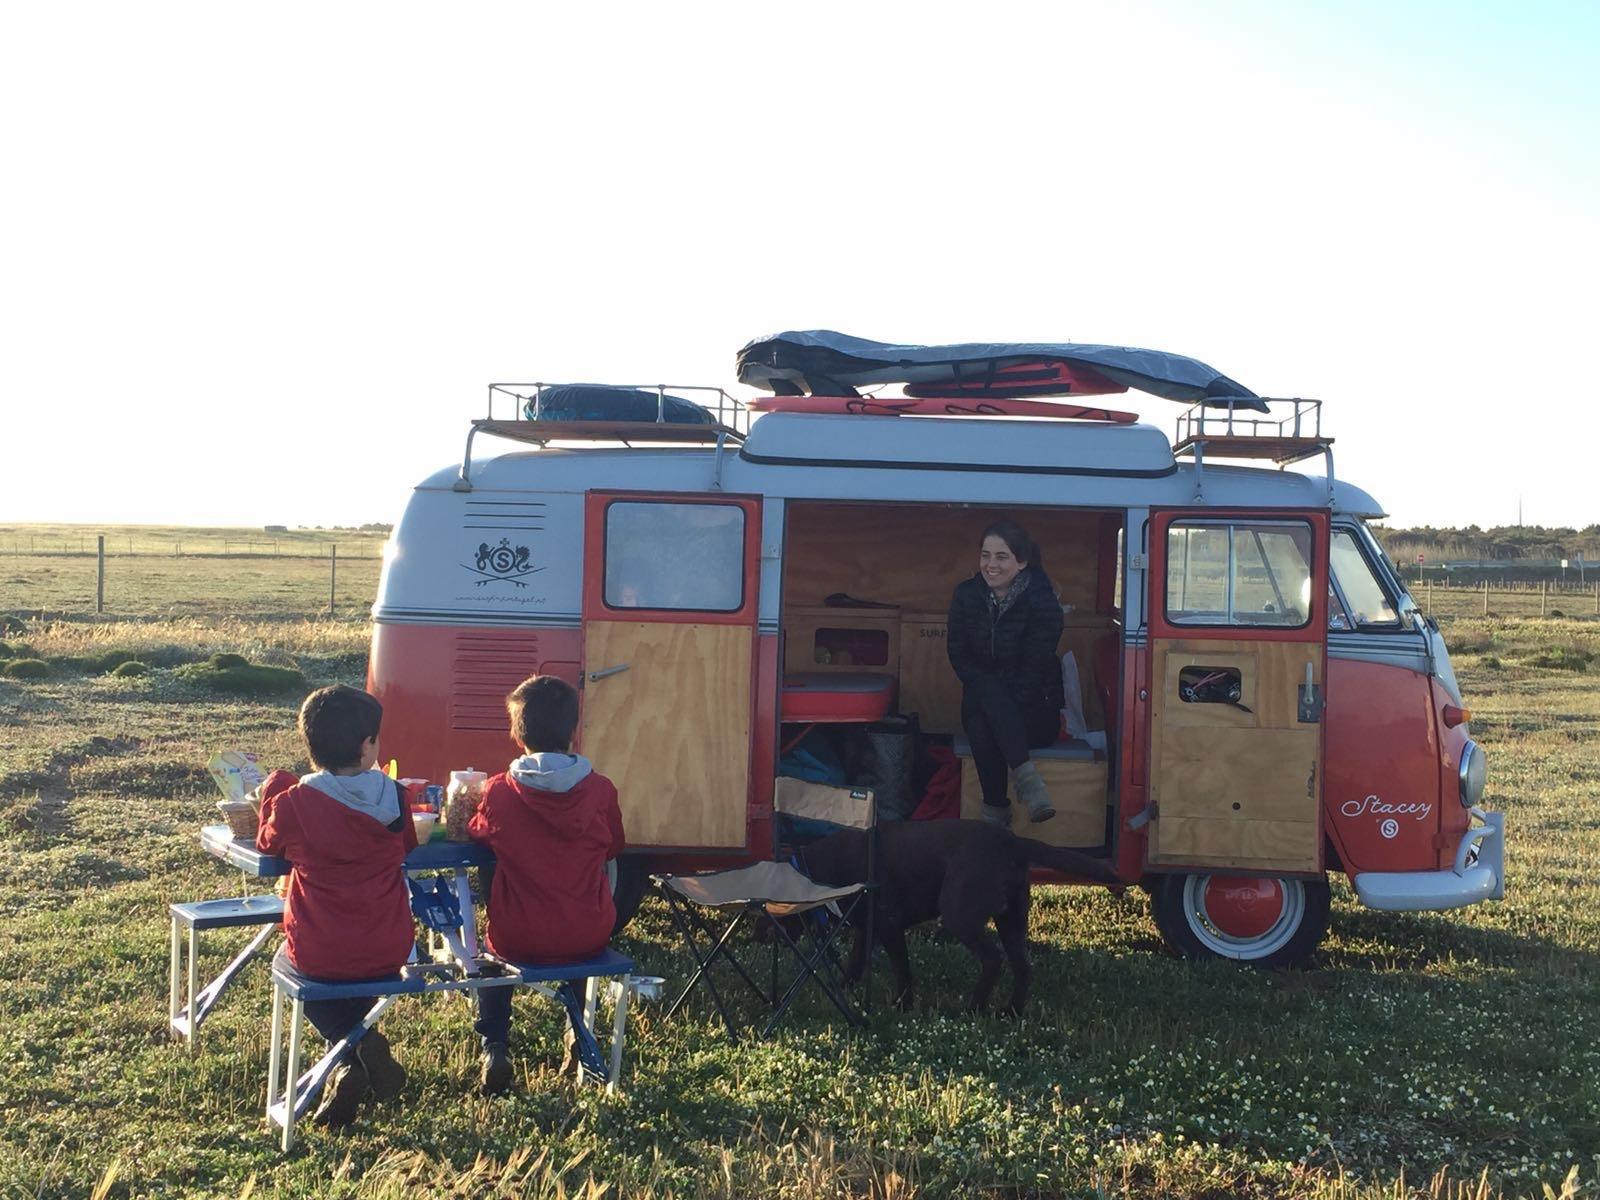 Cru com Pinta, Camping, Camping em família, natureza, healthy lifestyle, healthy living, raw foods,